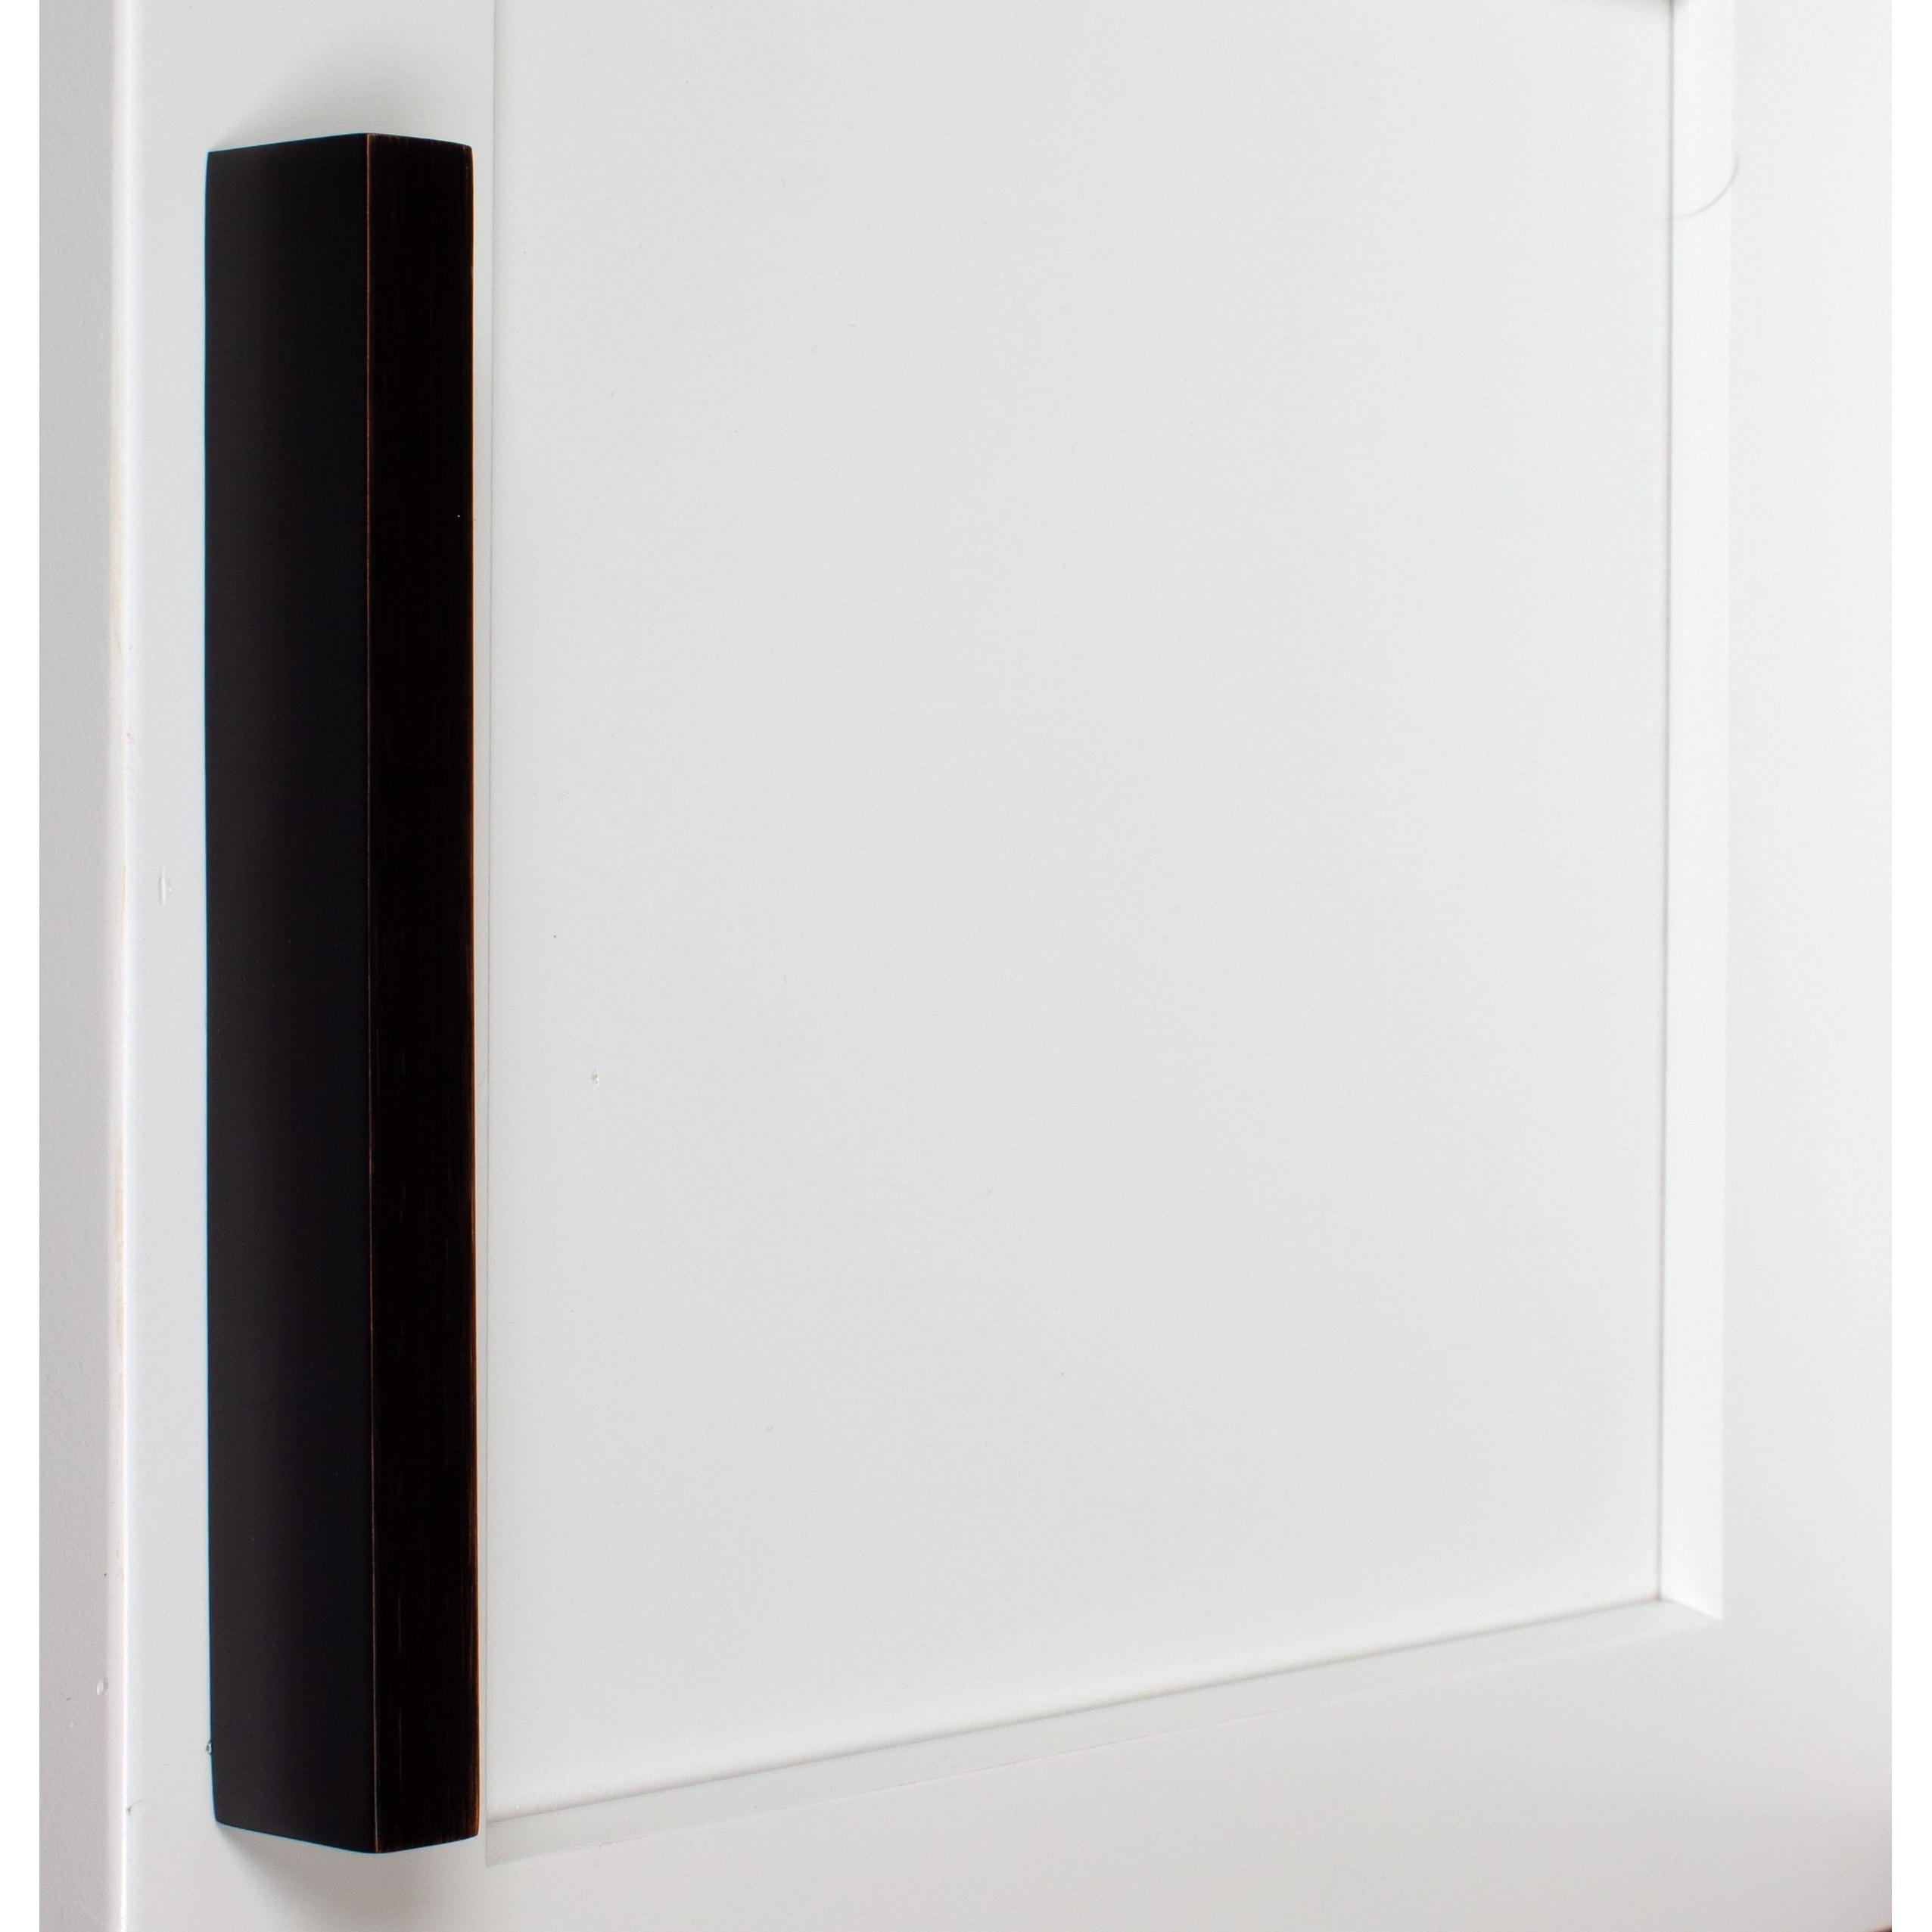 Picture of: Shop Gliderite 5 In Cc Cabinet Finger Pulls Rubbed Bronze 10 Pk Oil Rubbed Bronze Overstock 31640737